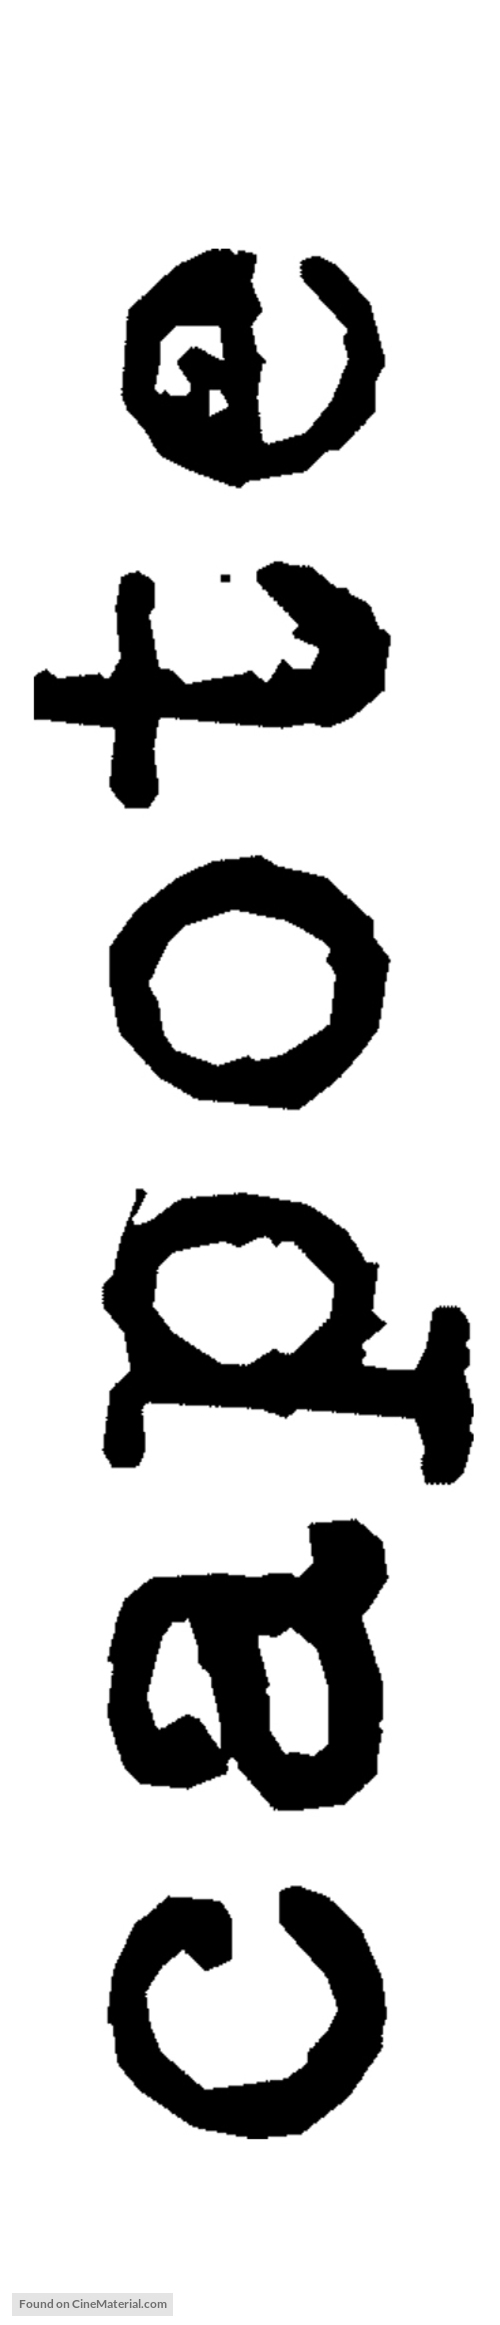 Capote - Logo